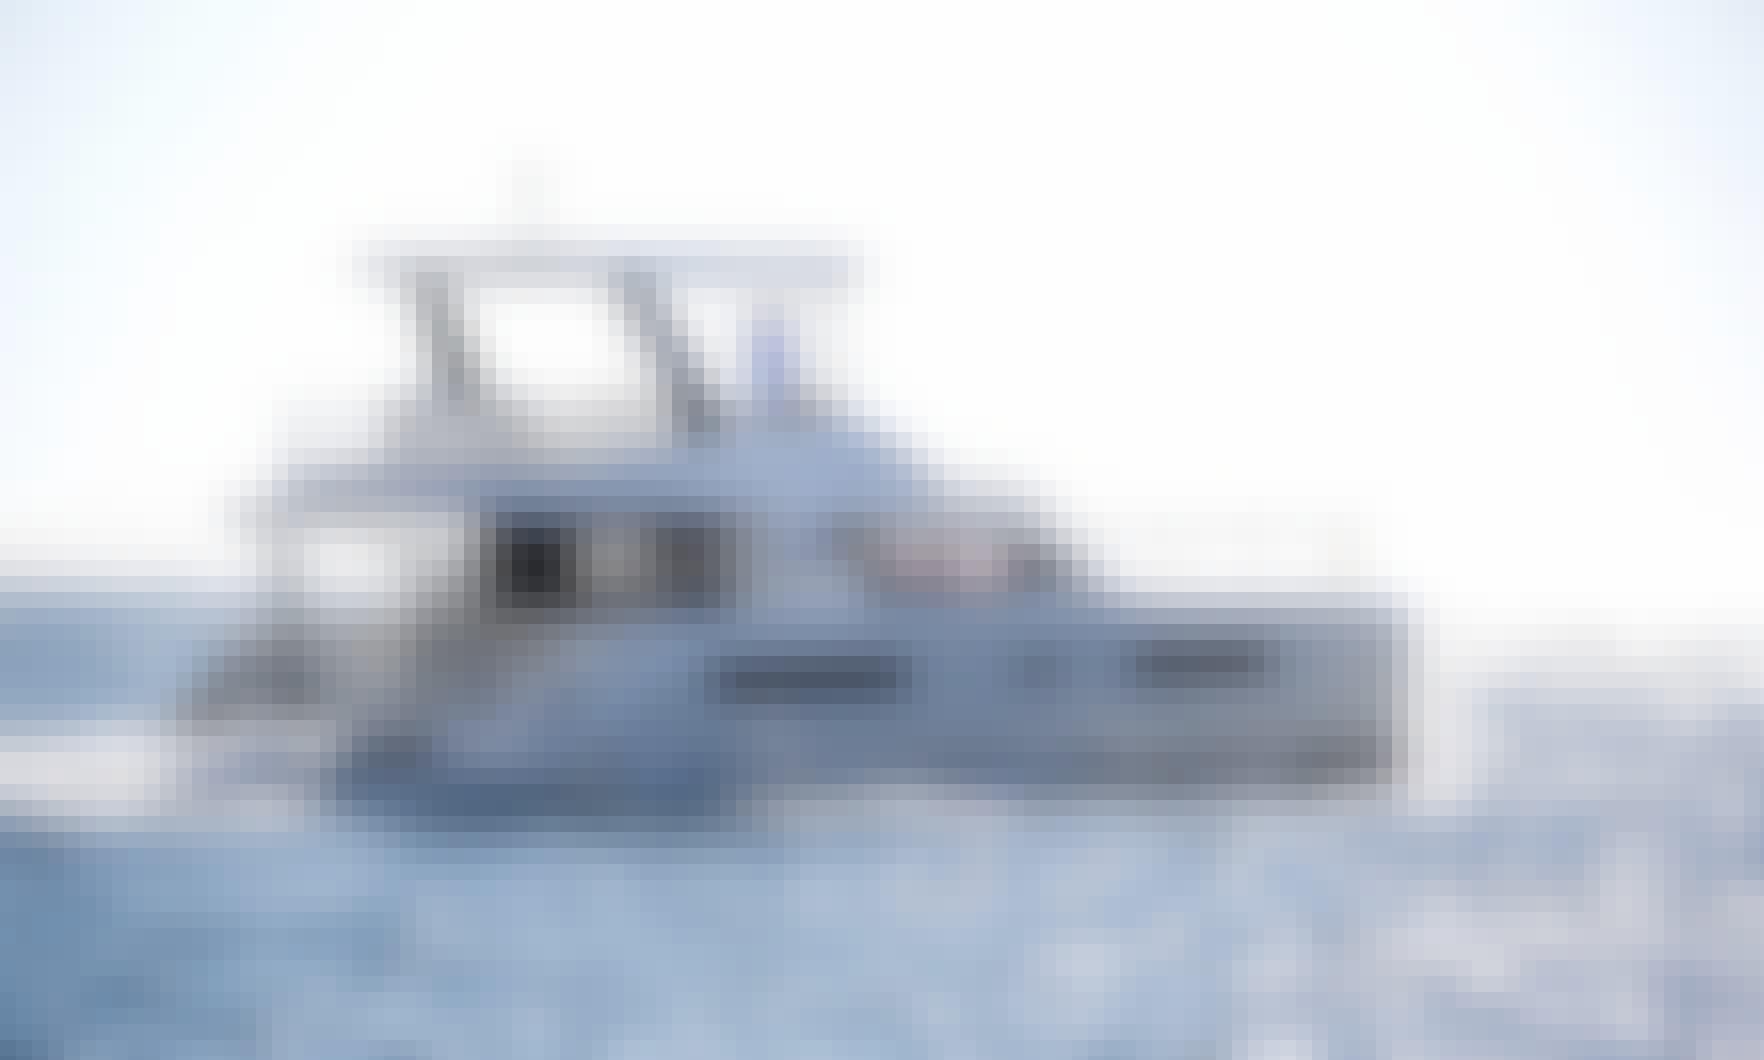 Leopard 43 PC Power Yacht Catamaran in Cartagena, Colombia